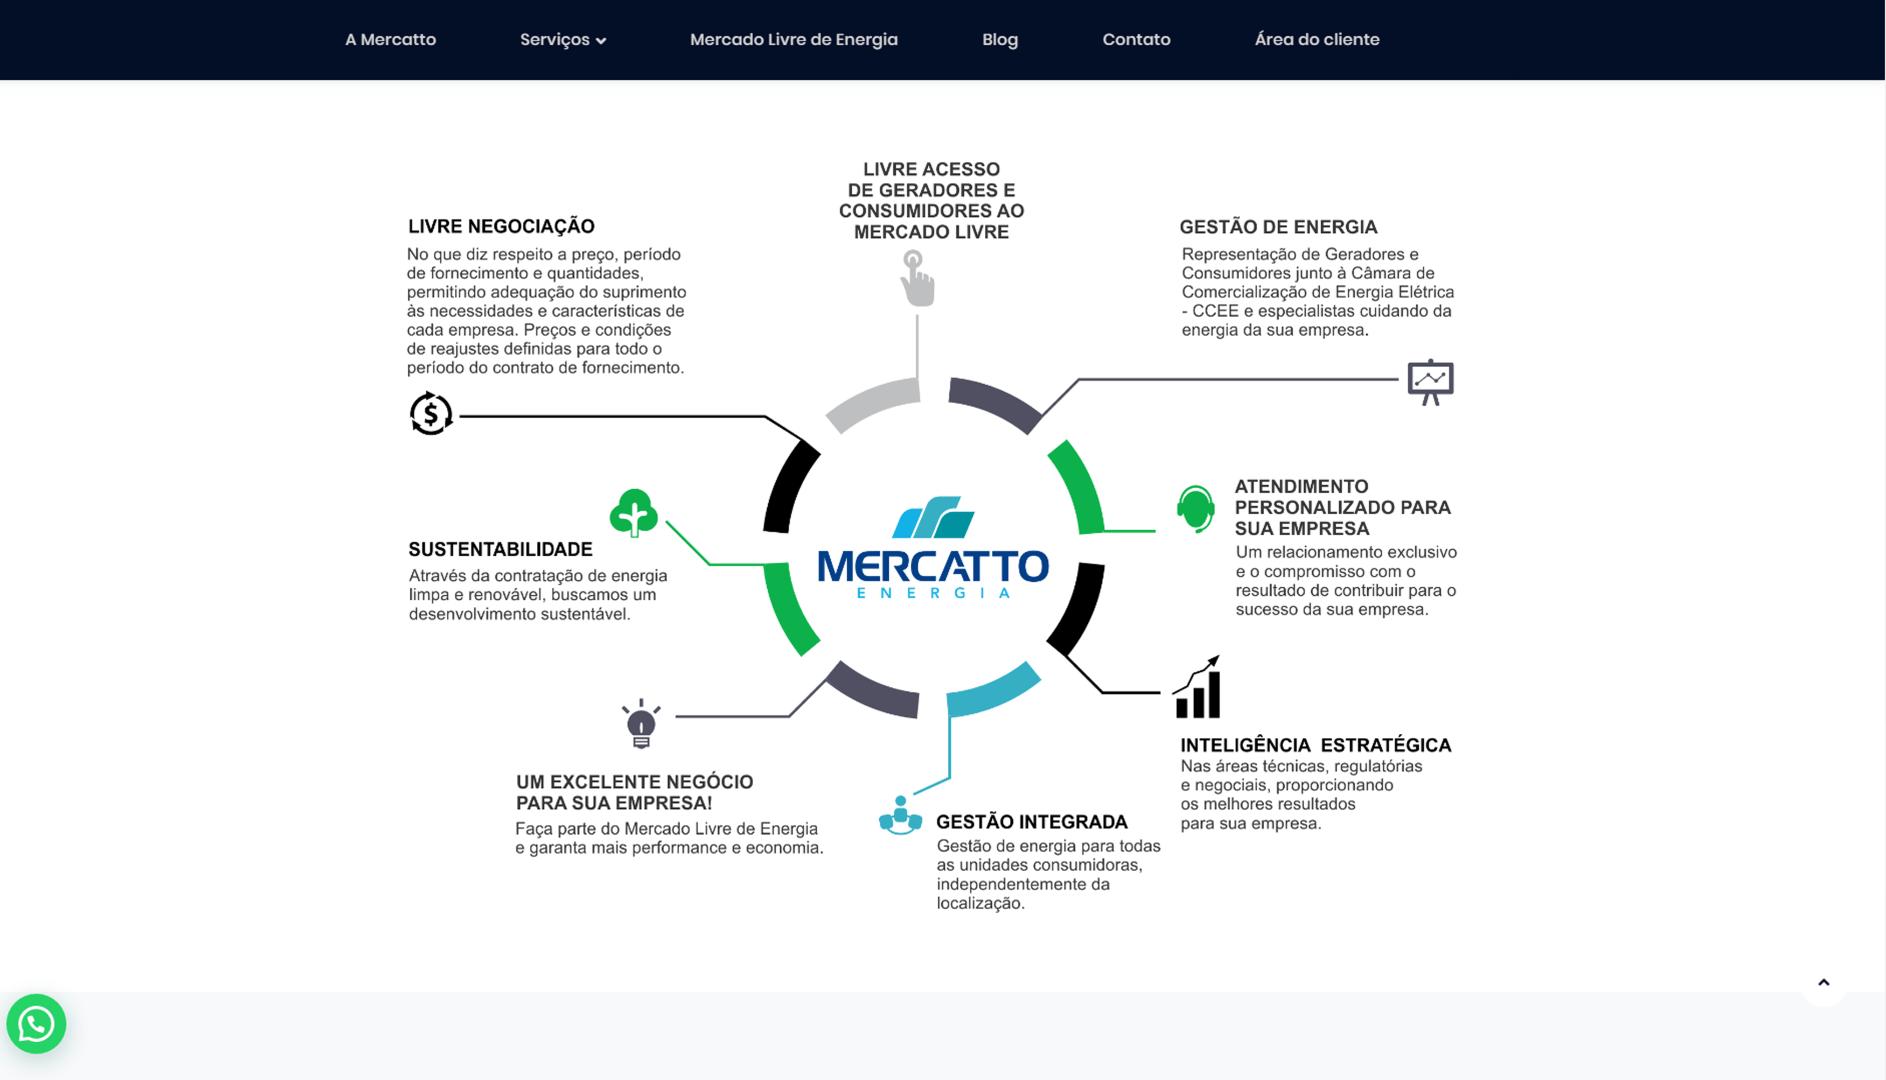 https://www.6i.com.br/case/site-mercatto-energia/